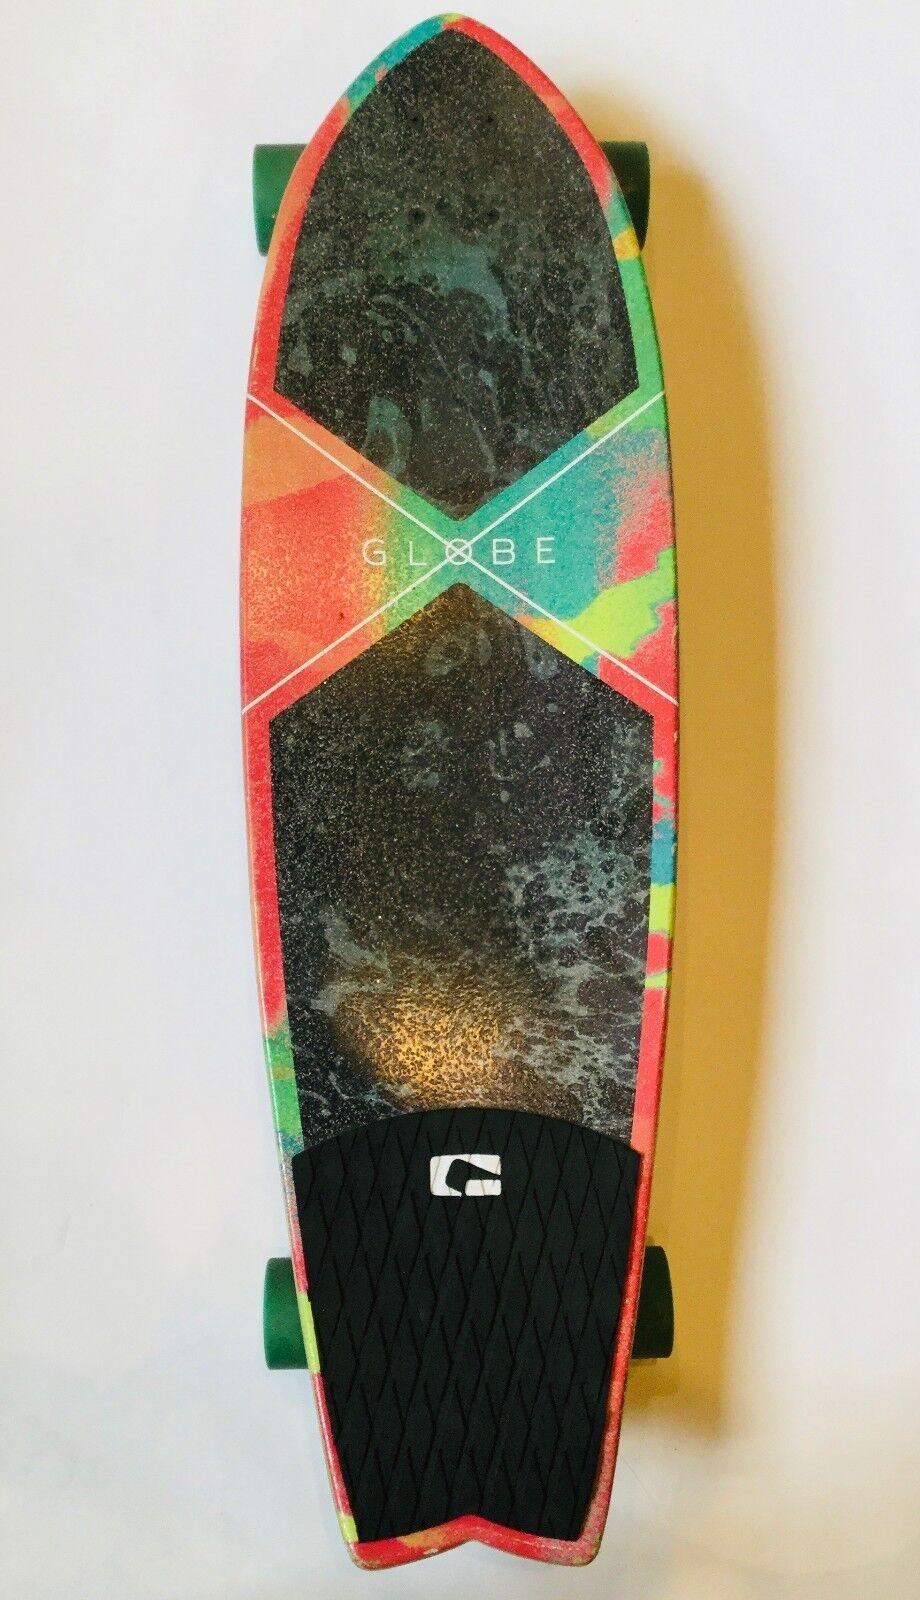 34  Vibrant  Watercolor GLOBE Longboard  discounts and more